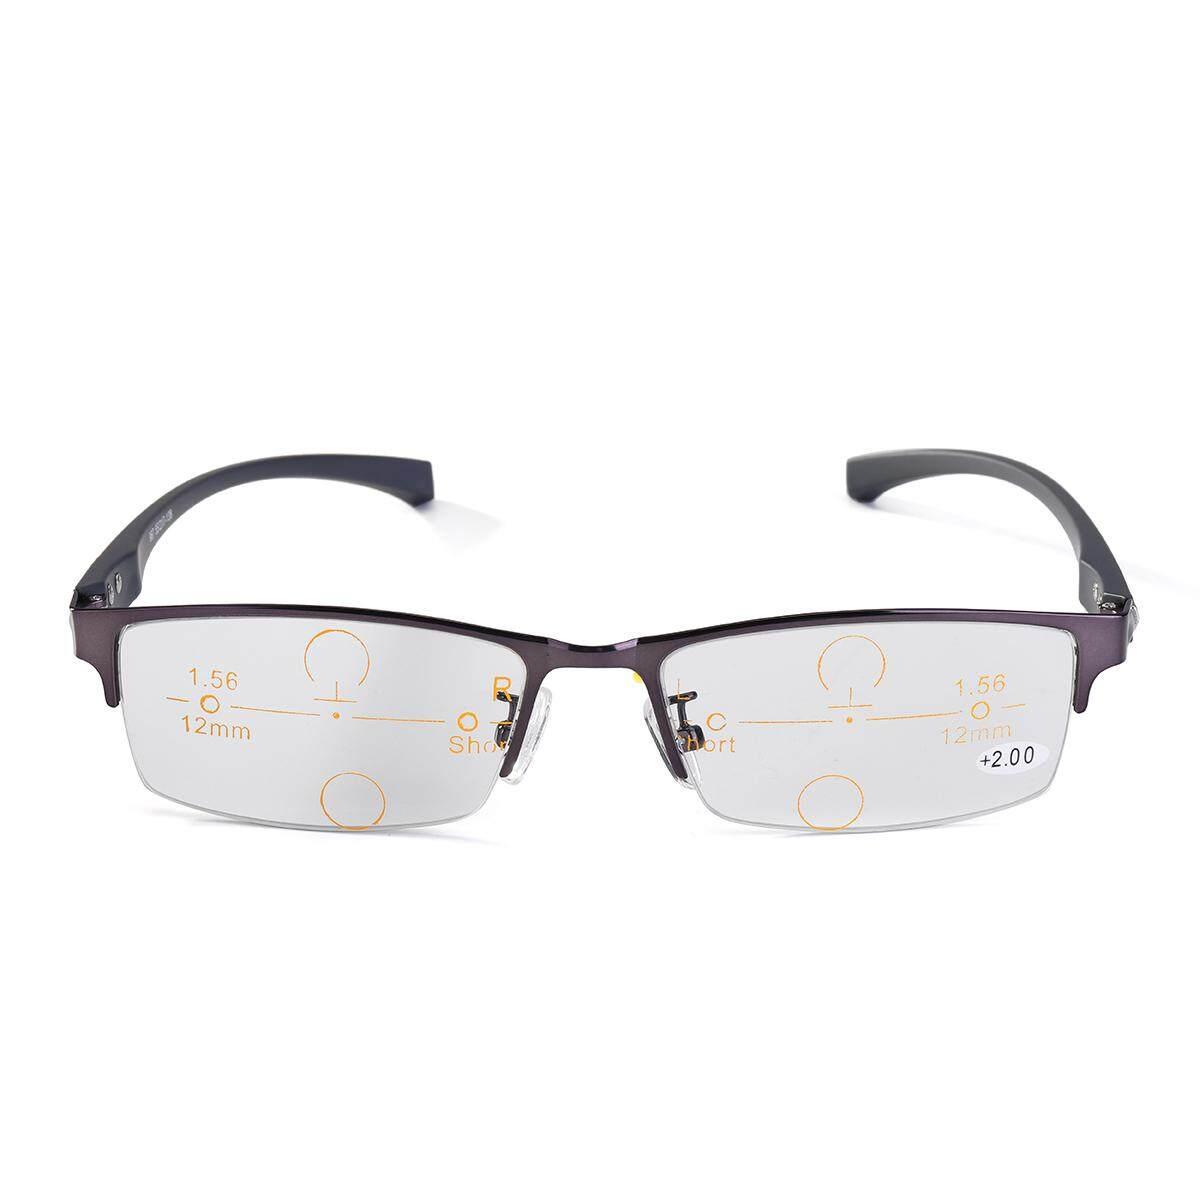 20cb2ed53e80 150 Degree Photochromic Multi Focus Sunglasses Progressive Transition Reading  Glasses